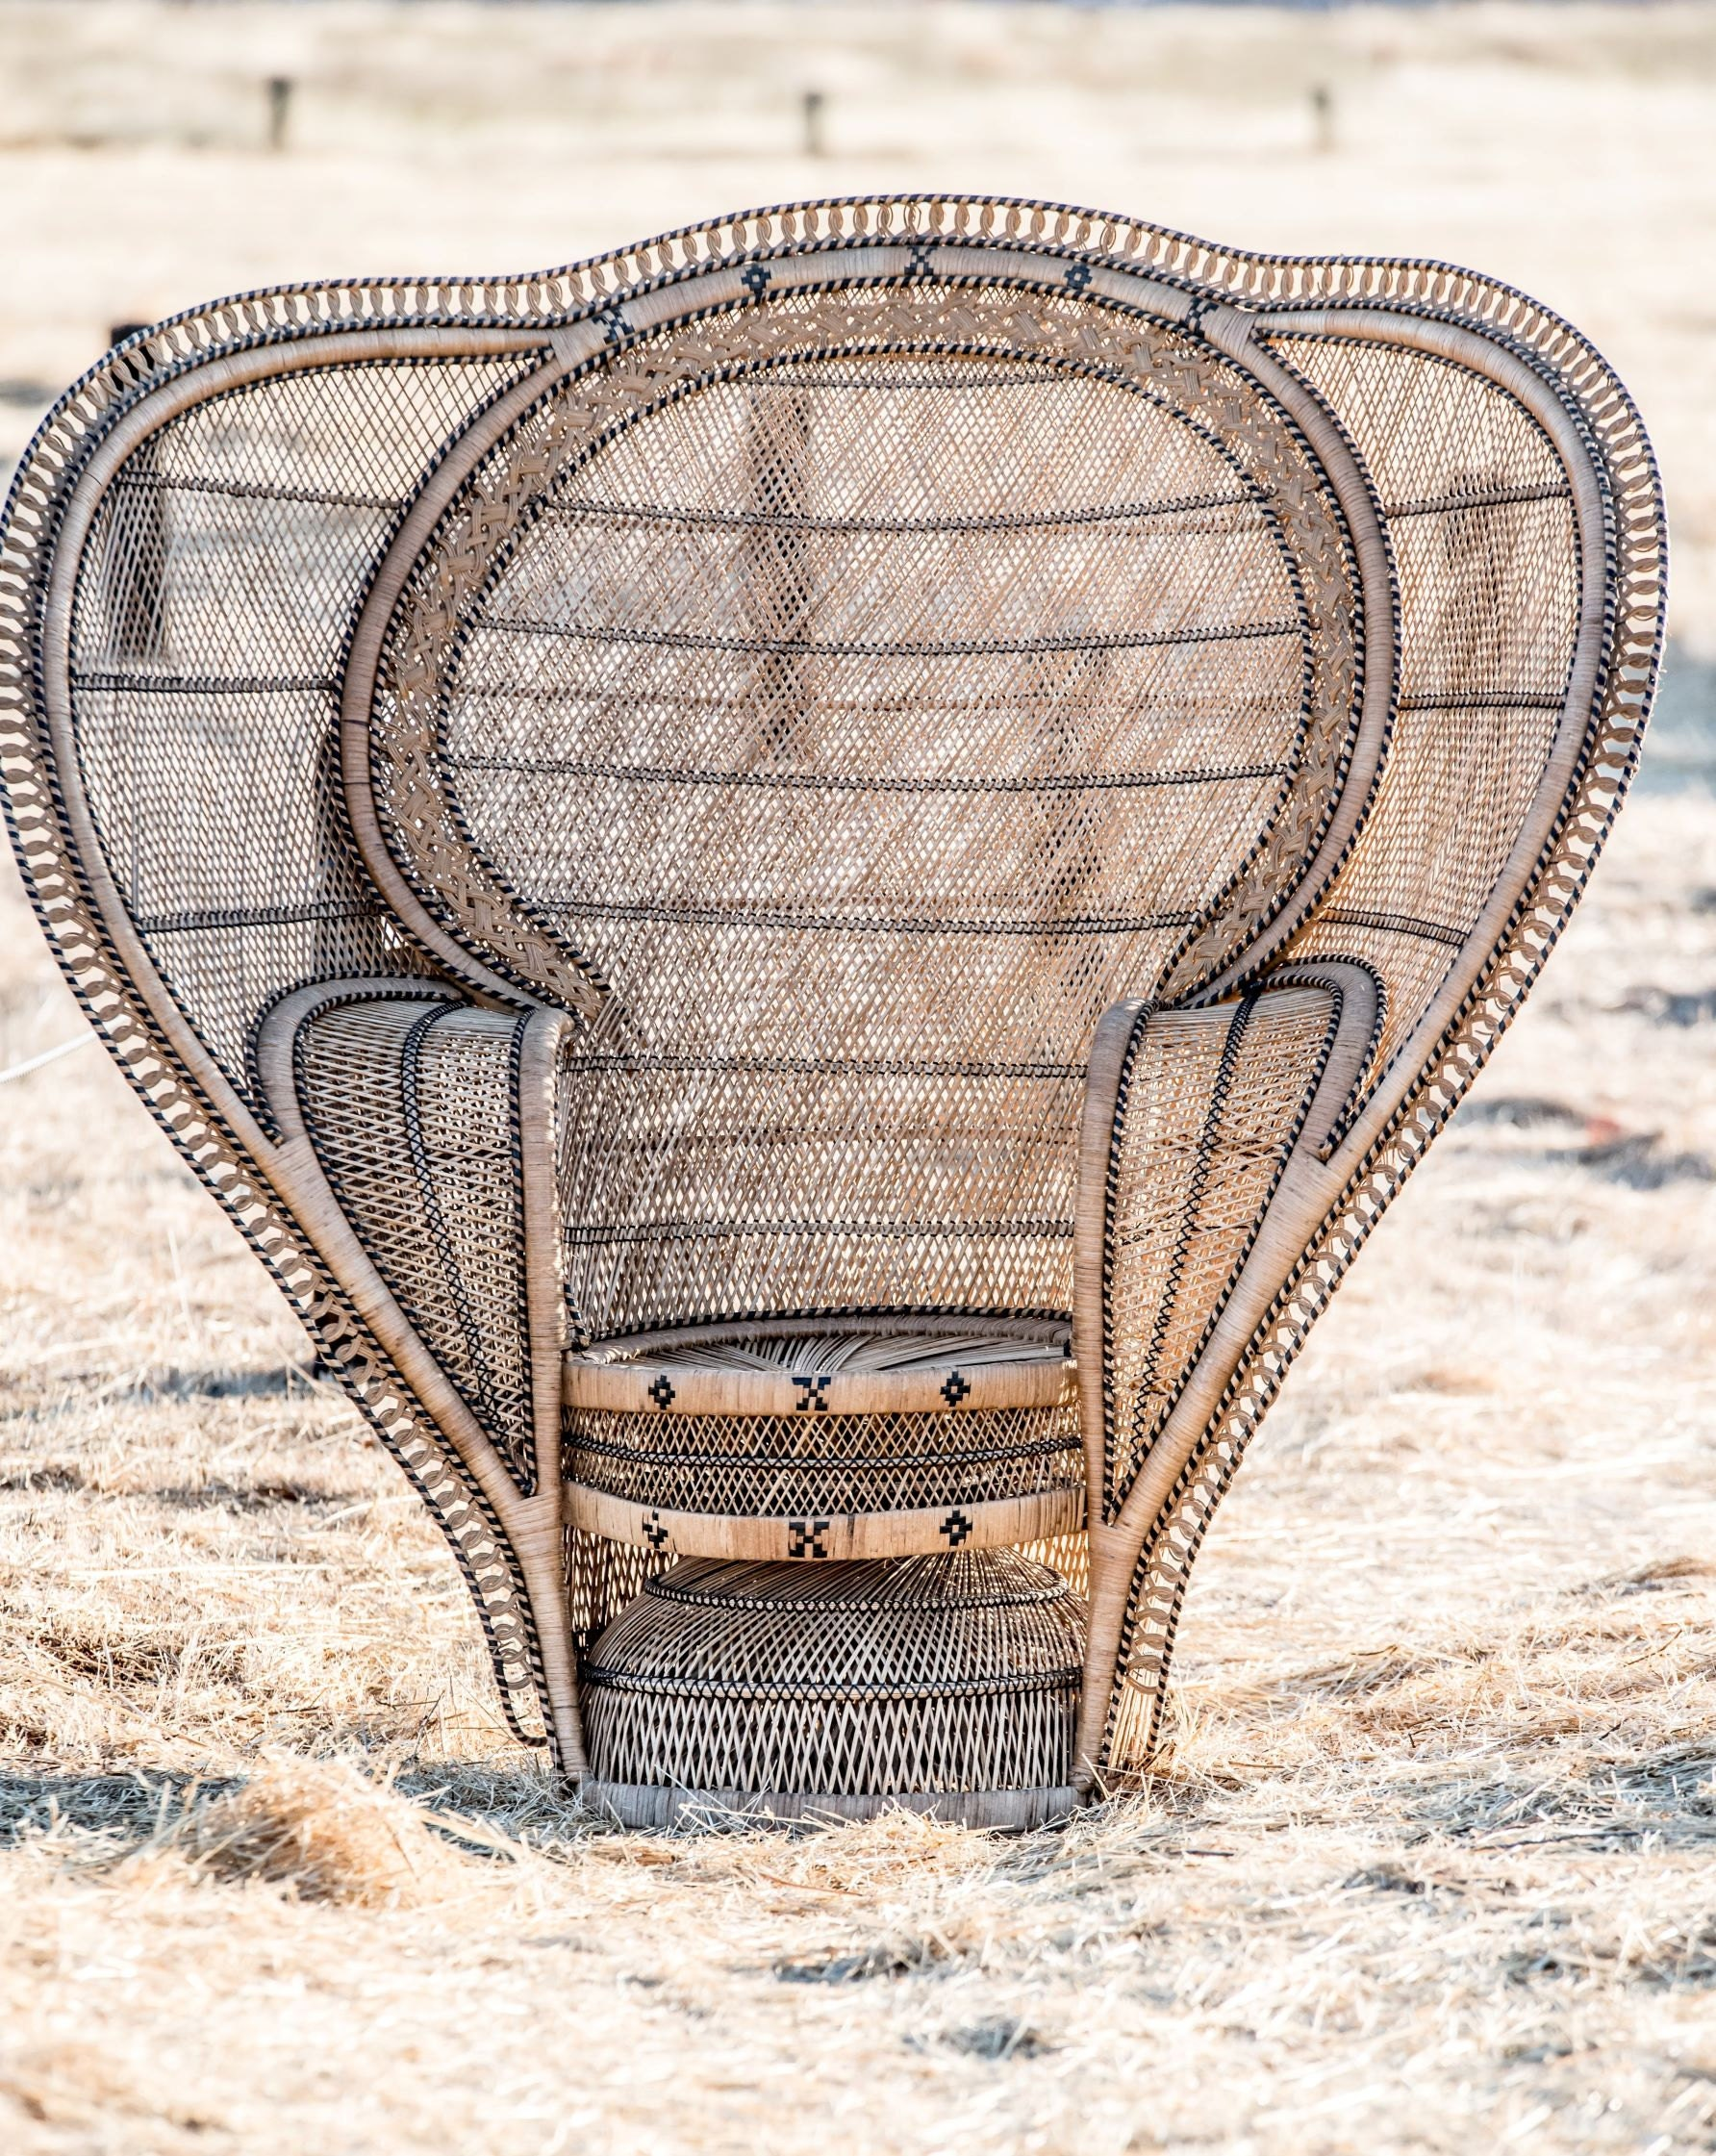 White Elephant Co. XL Cobra Peacock Chair